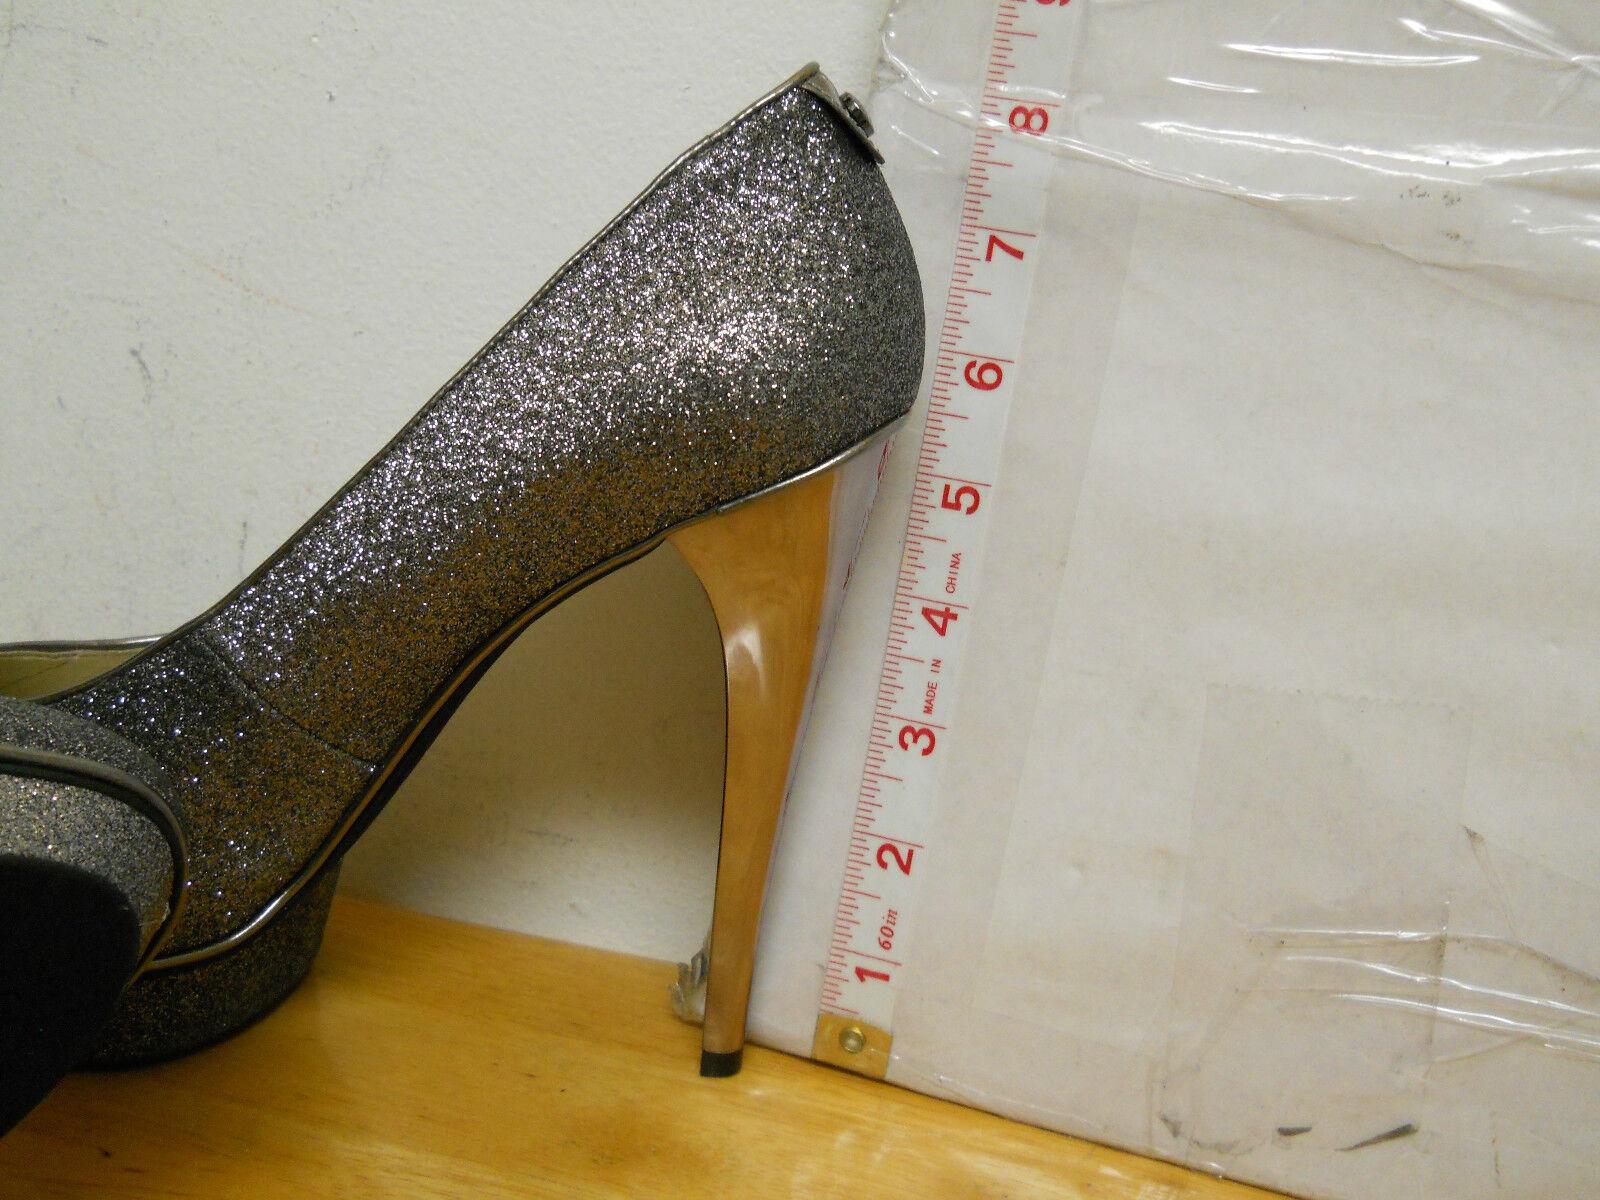 Michael Kors New New New Damenschuhe Gunmetal Glitter Heels 9.5 M Schuhes NWOB 538e47